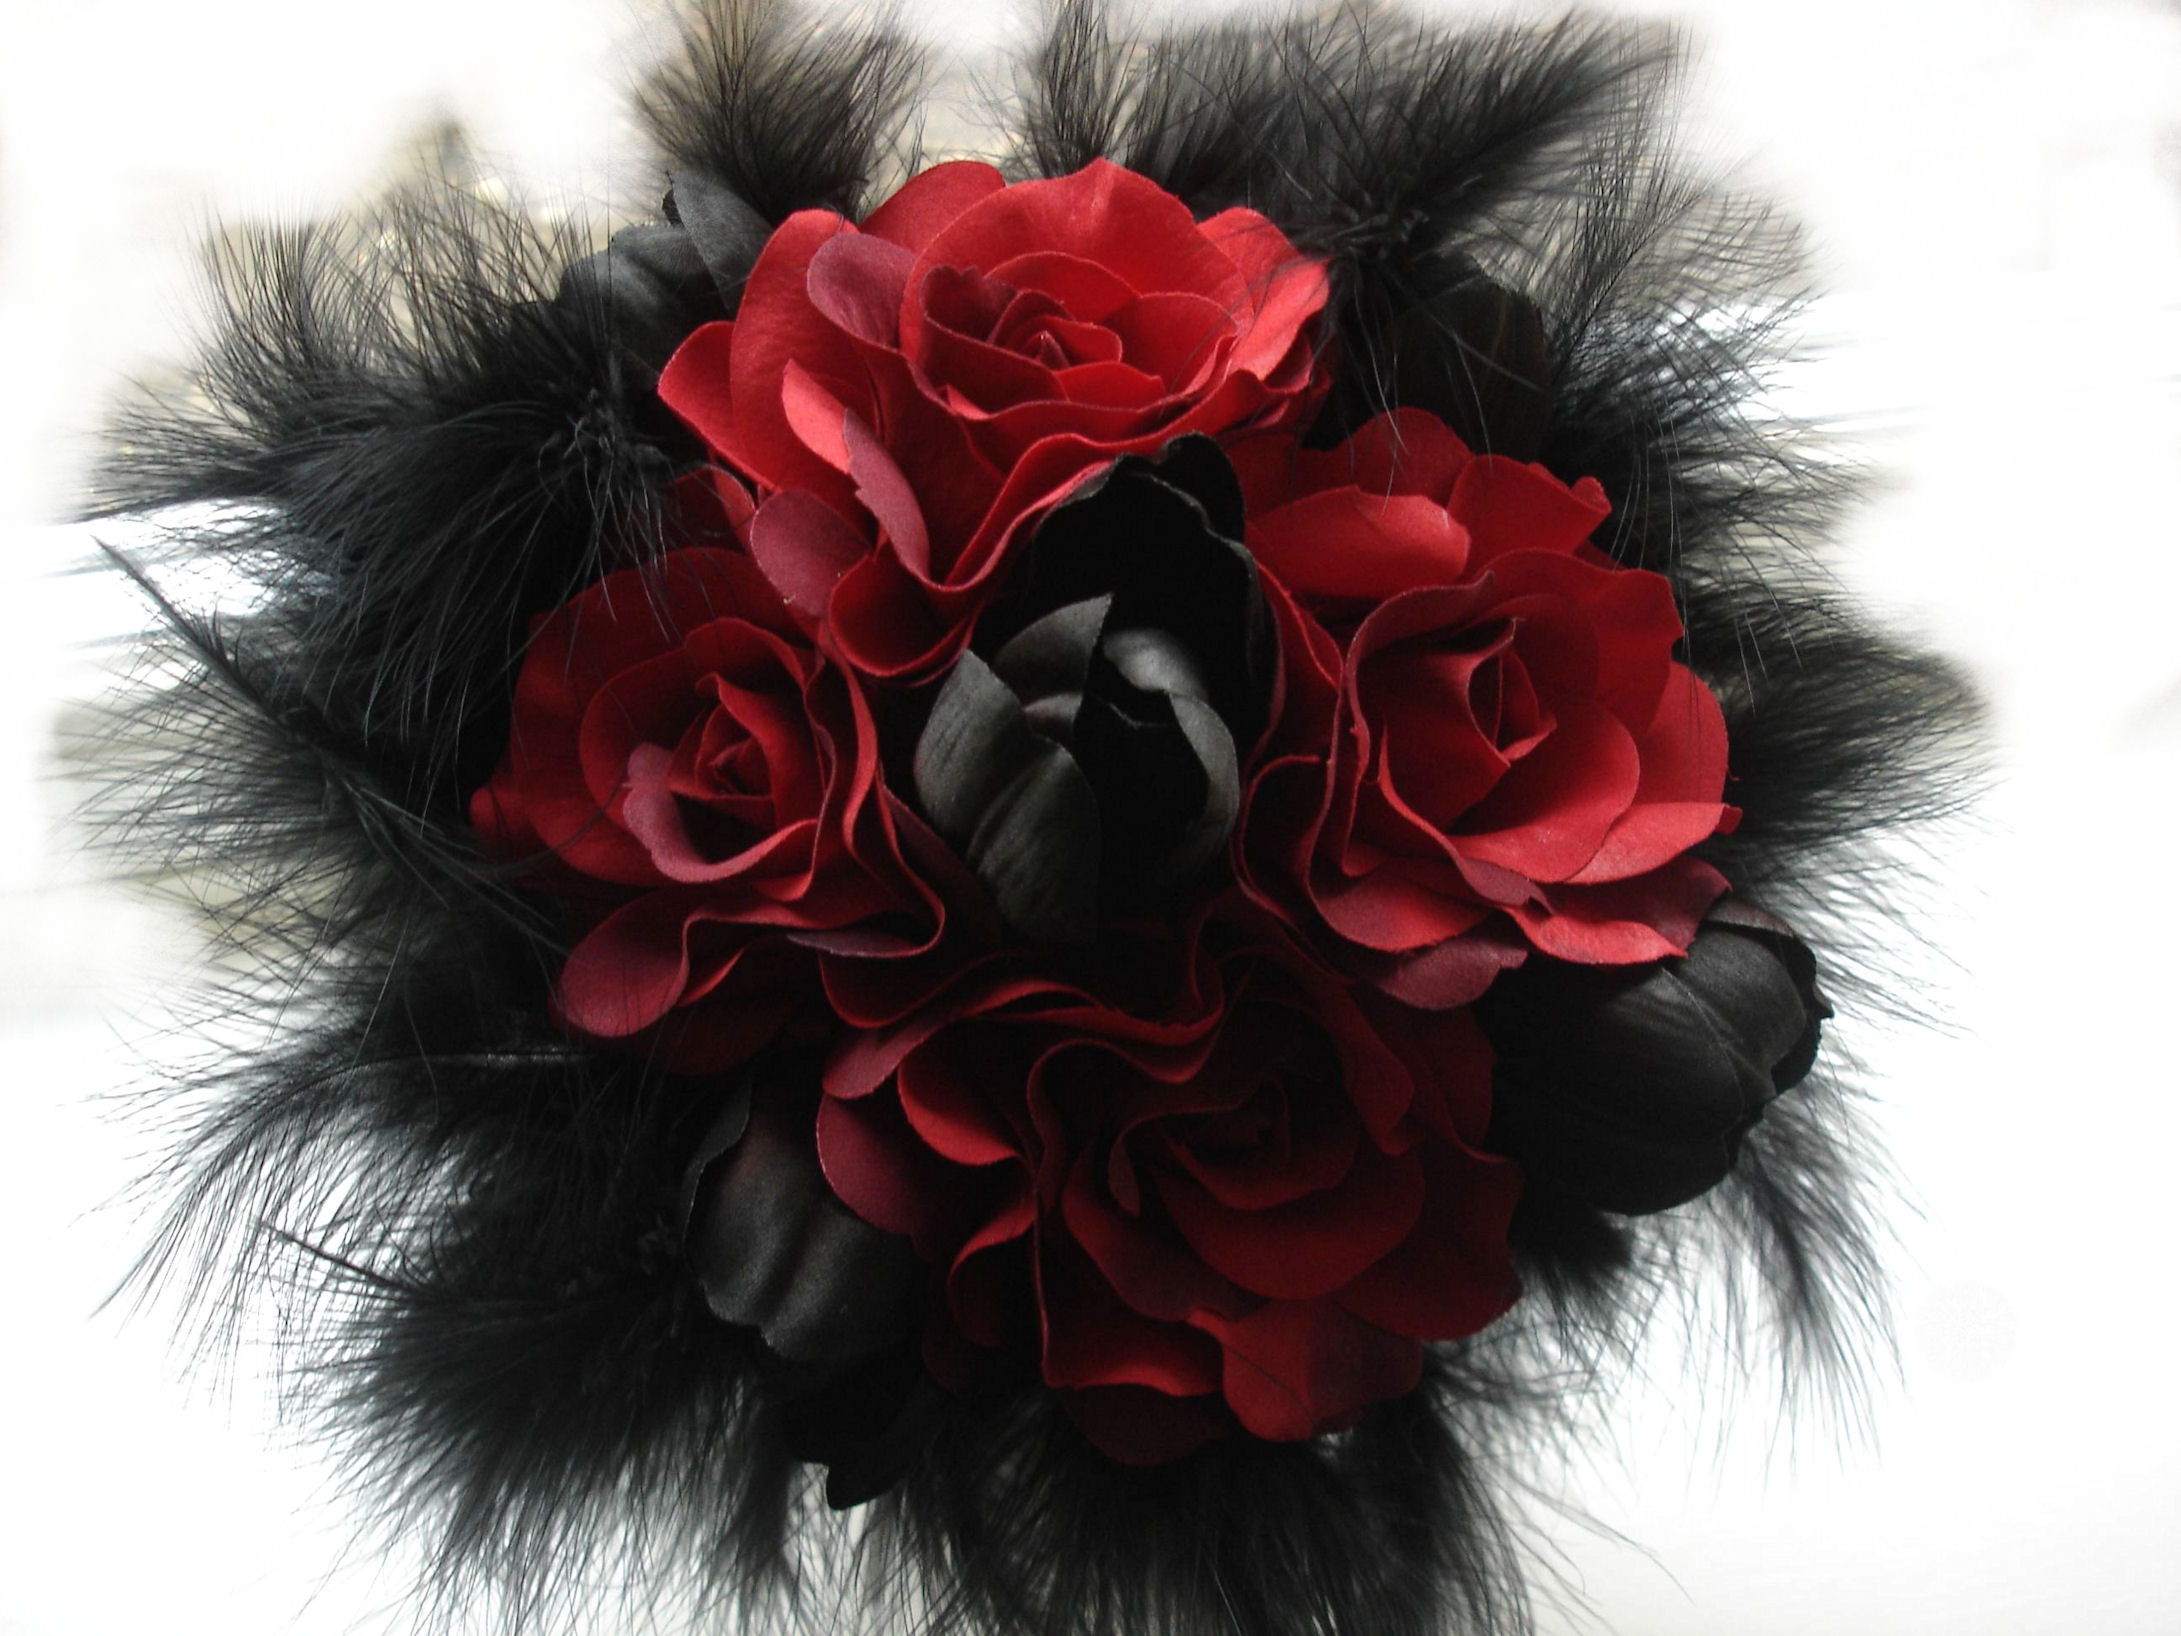 gothic roses dark flowers wallpaper 2181x1636 85300